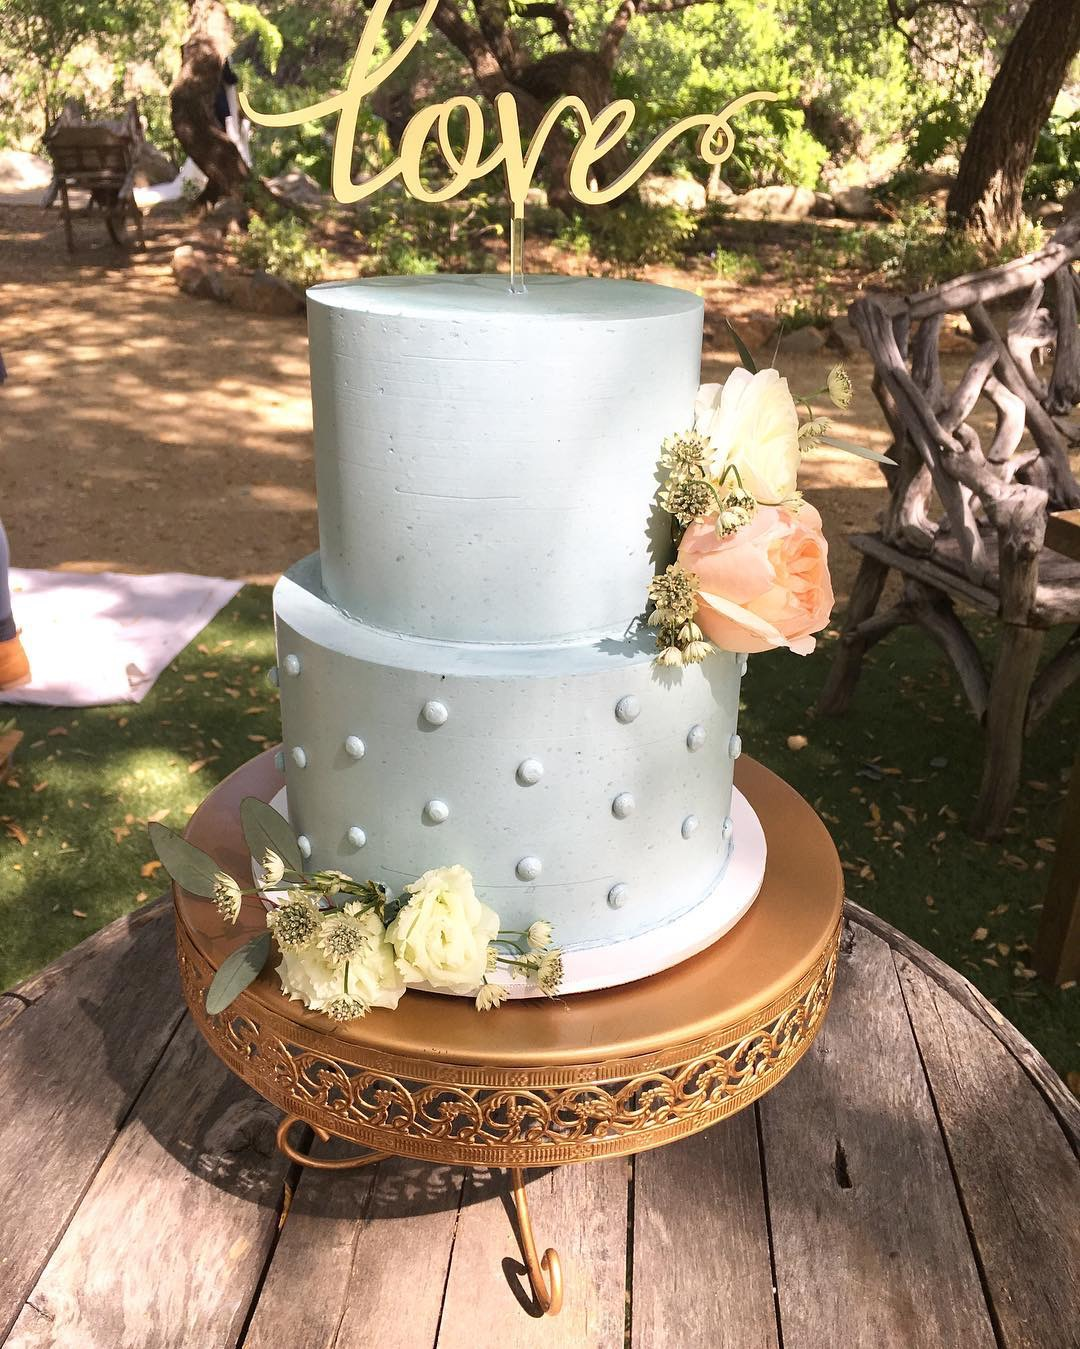 Love cake-topper-loppy-band-cake-stand-opulent-treasures.JPG